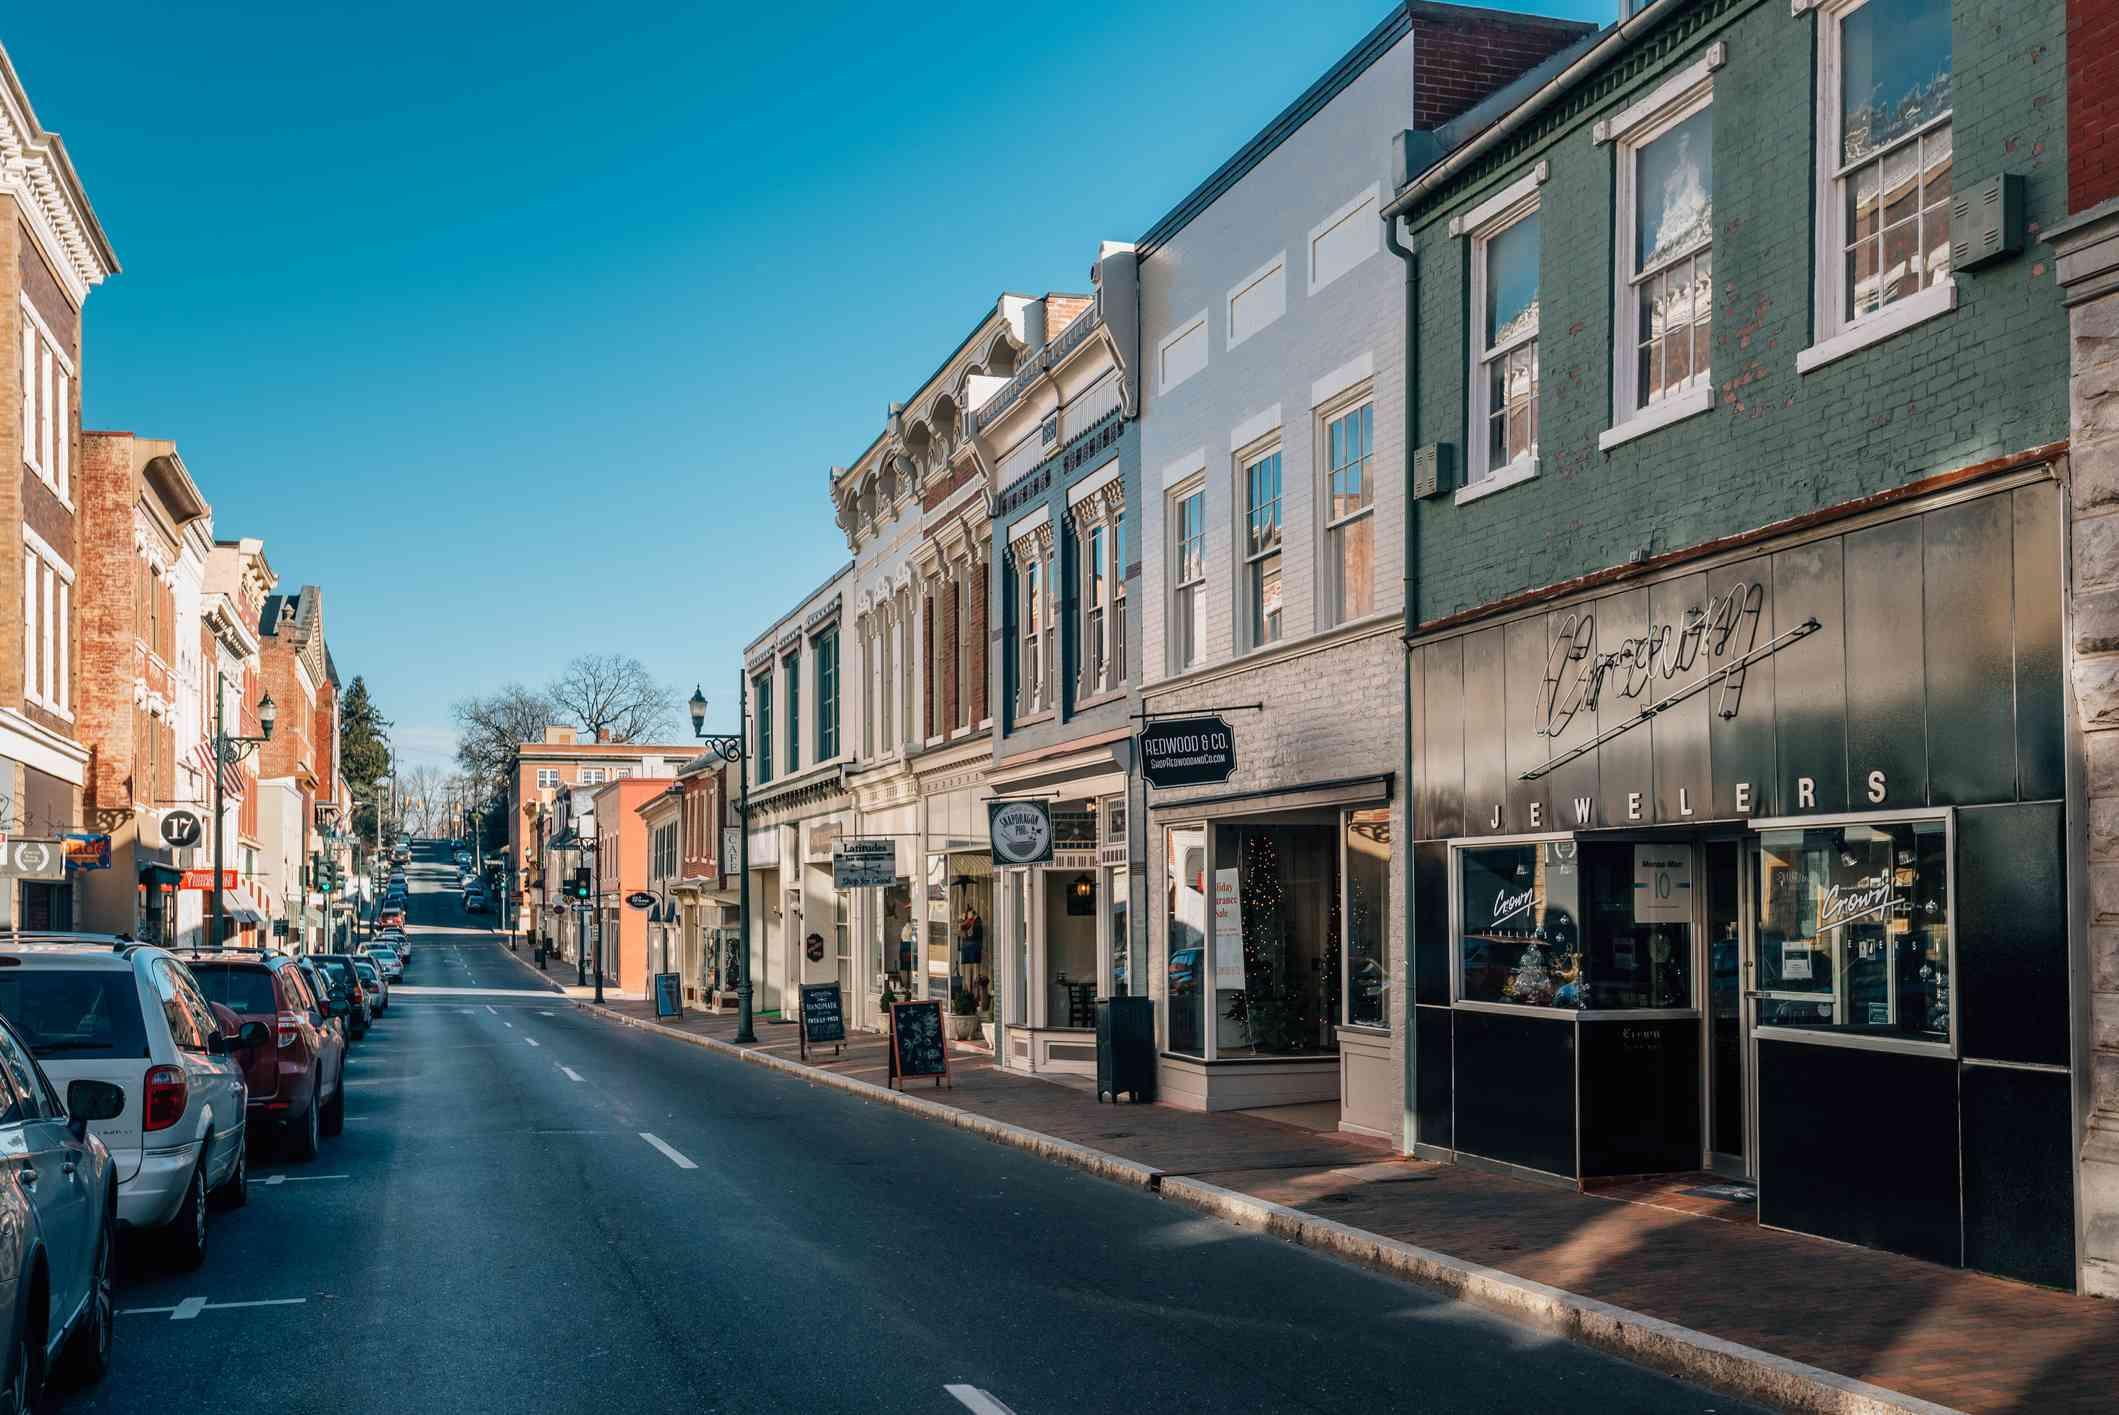 Beverly Street, in downtown Staunton, Virginia